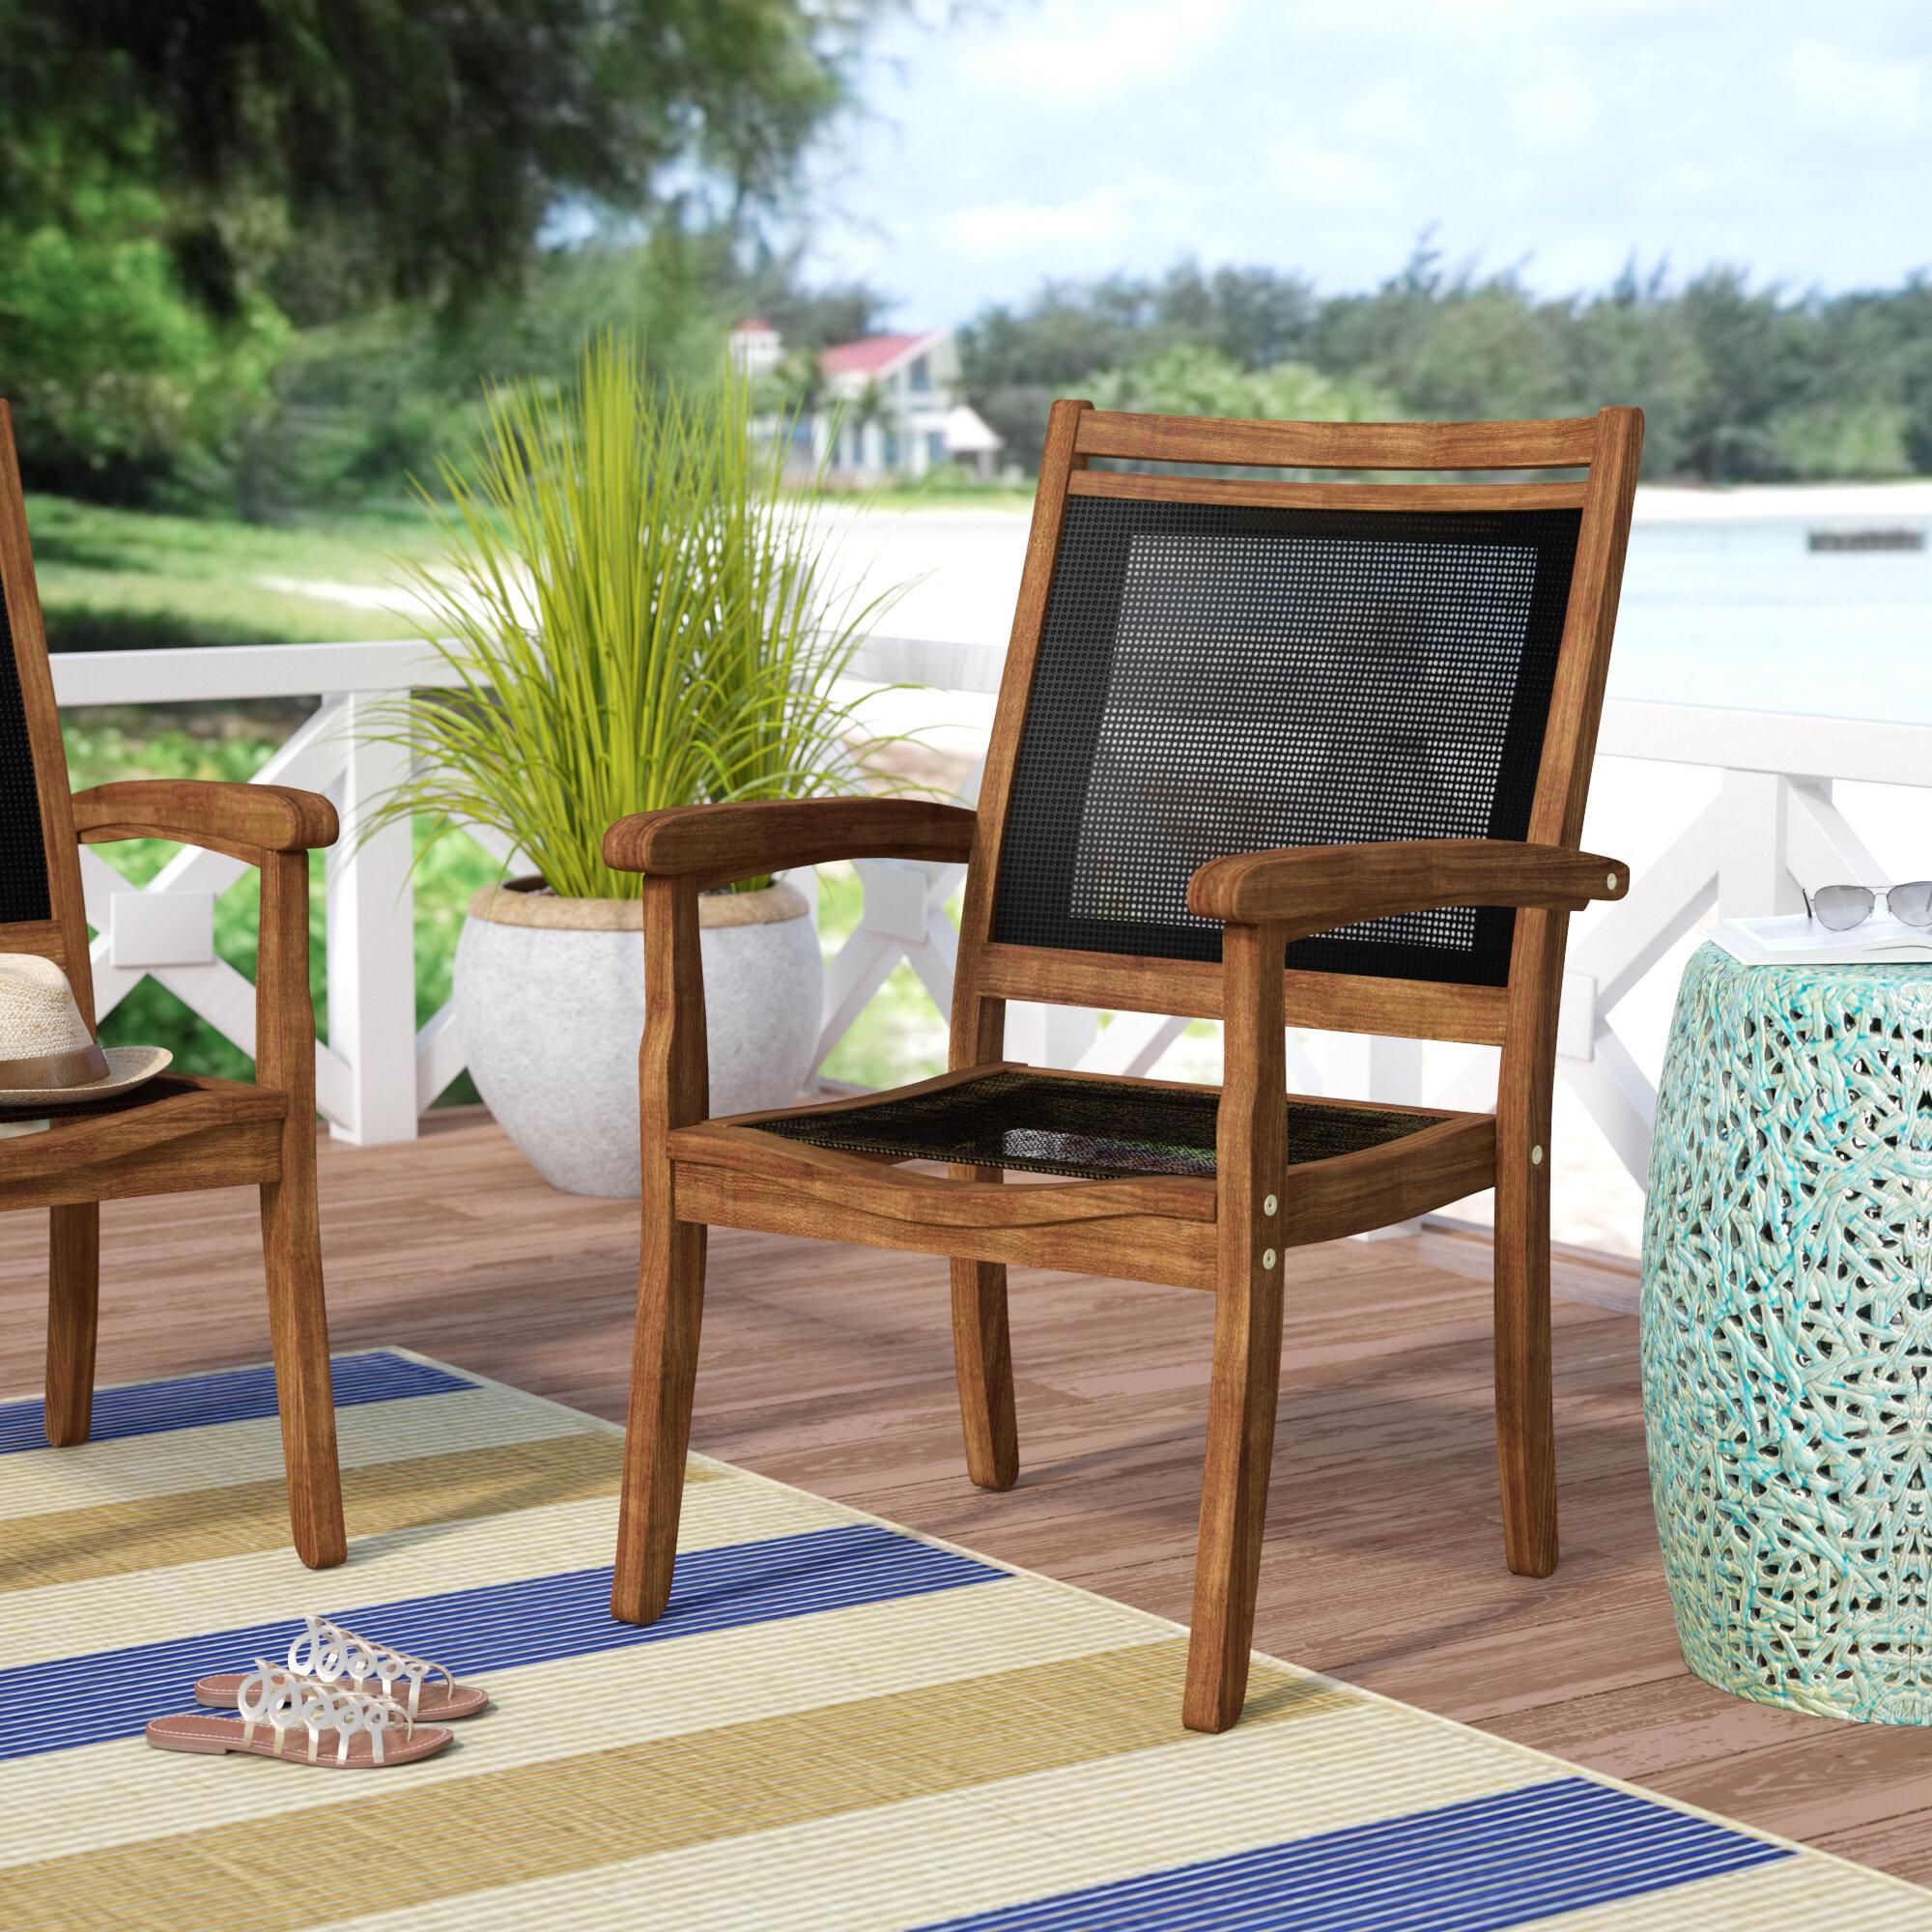 Tovar Sling And Eucalyptus Patio Chair